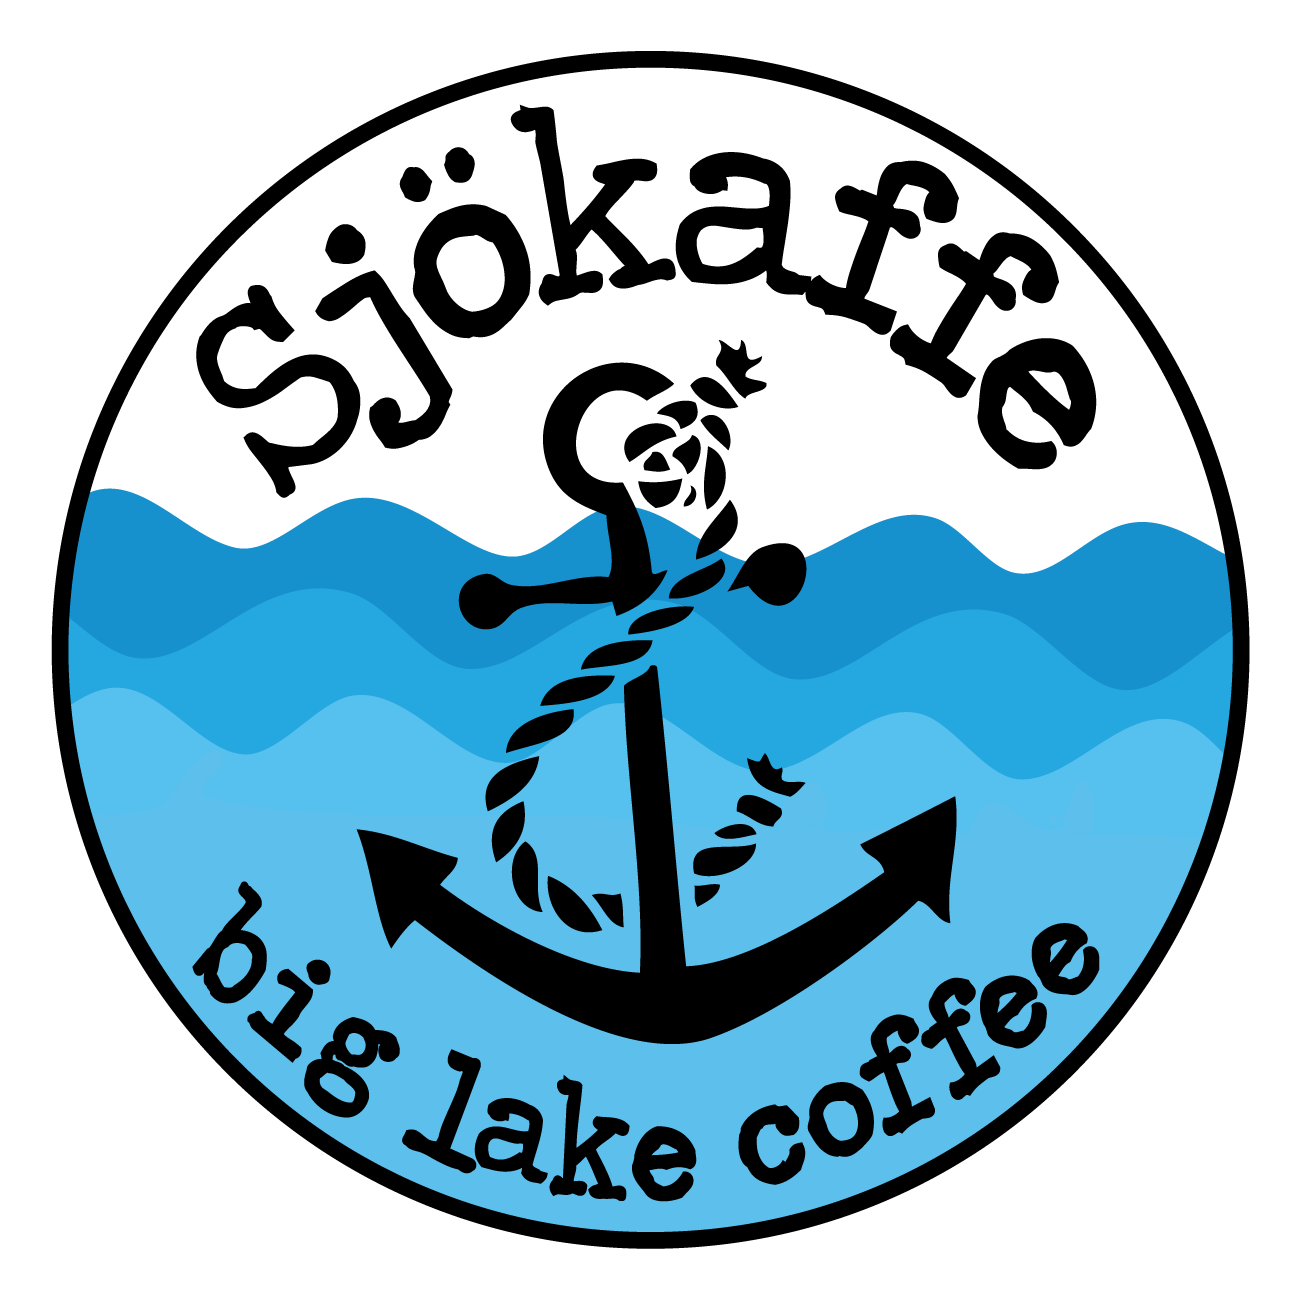 Sjökaffe: Artisan Lake Coffee